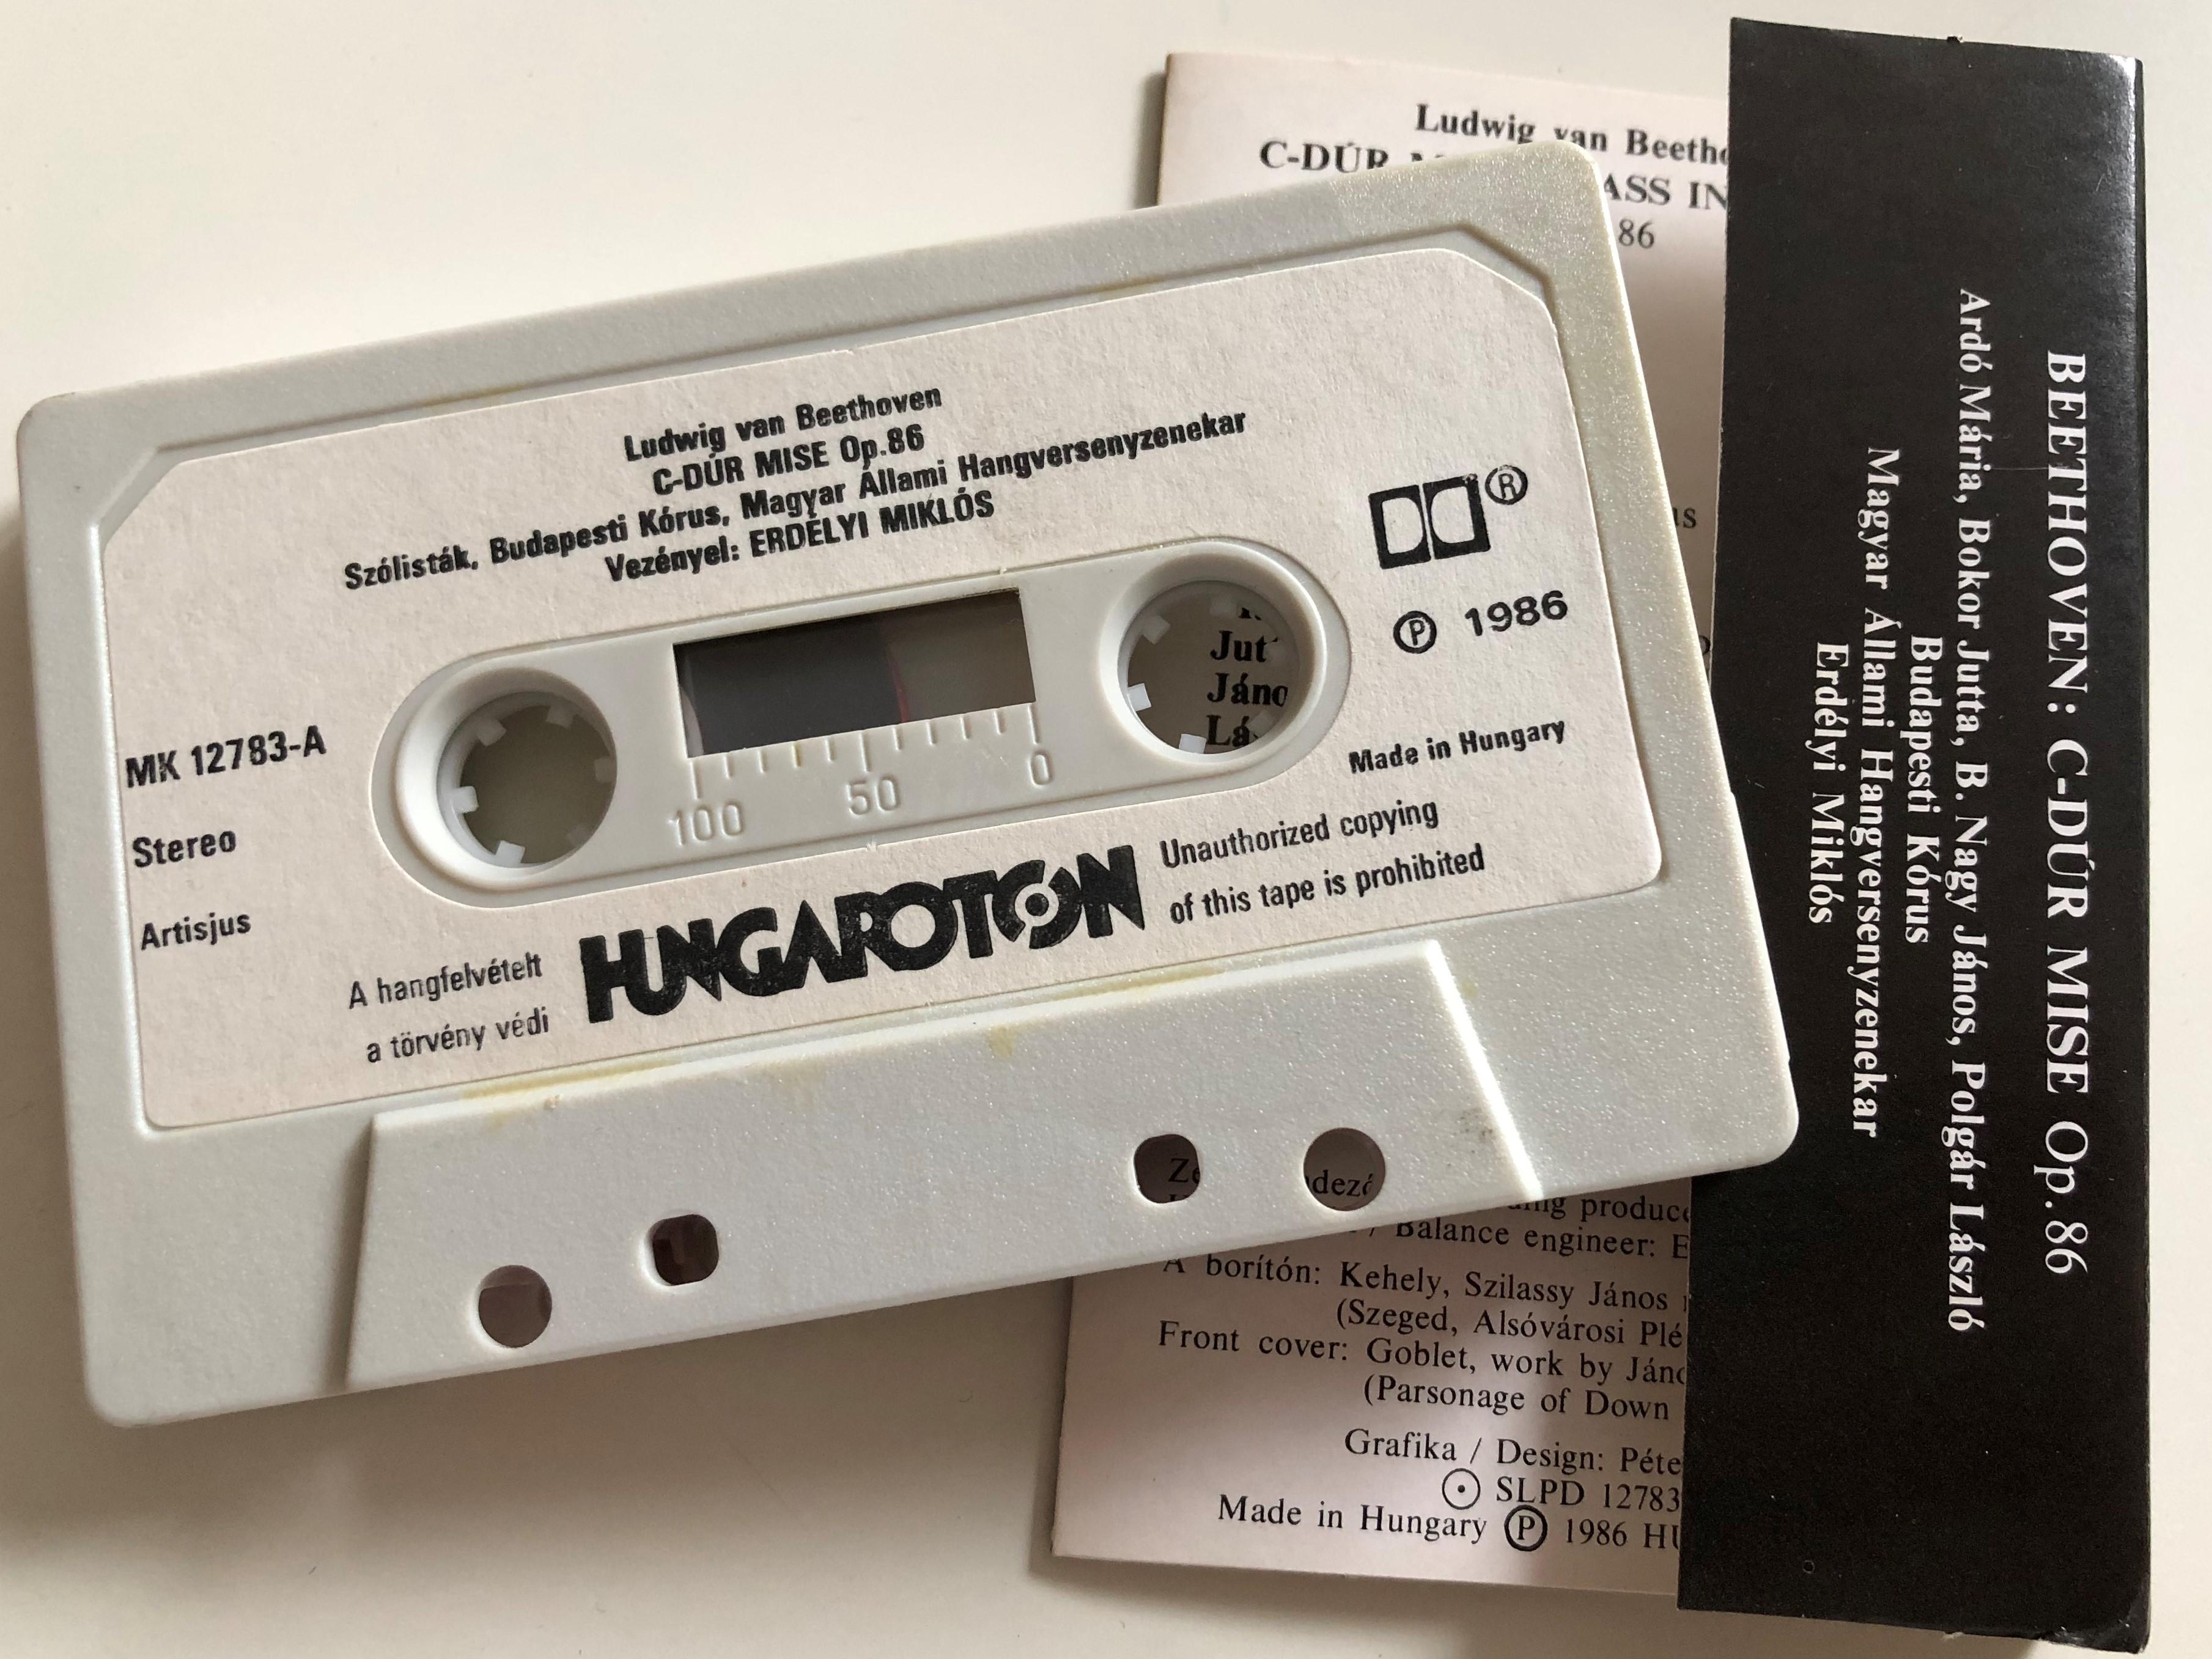 beethoven-mass-in-c-major-op.86-m-ria-ard-jutta-bokor-janos-b.-nagy-l-szl-polg-r-budapest-chorus-hungarian-state-orchestra-conducted-mikl-s-erd-lyi-hungaroton-cassette-stereo-mk-12-3-.jpg